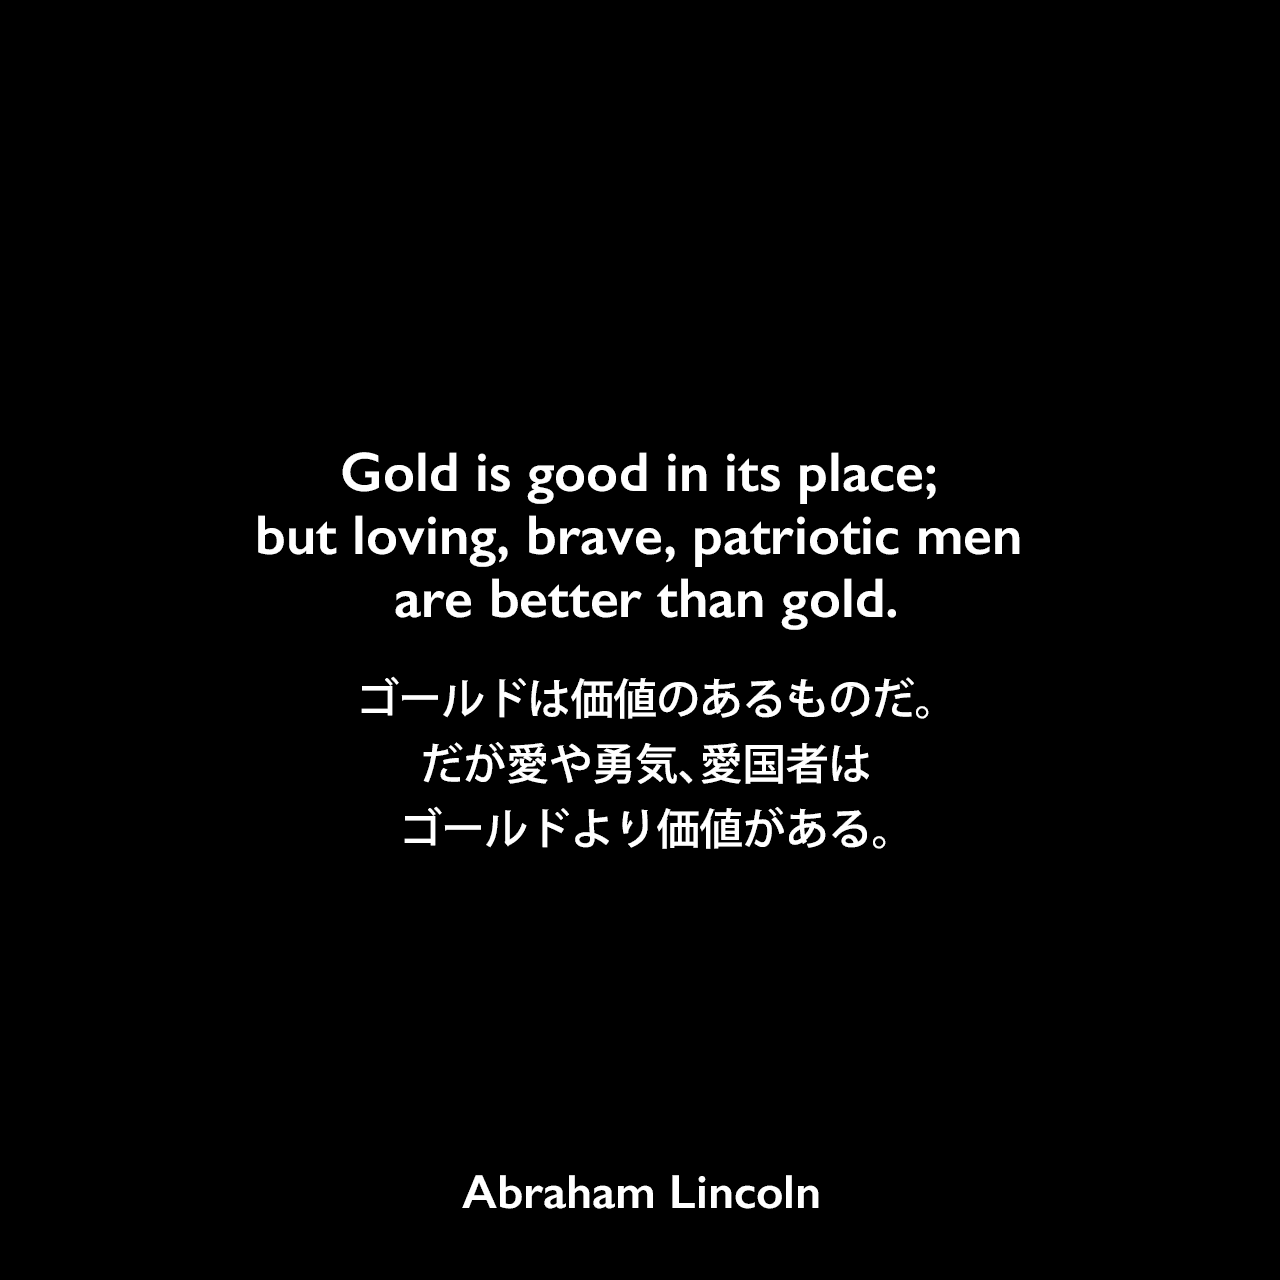 Gold is good in its place; but loving, brave, patriotic men are better than gold.ゴールドは価値のあるものだ。だが愛や勇気、愛国者はゴールドより価値がある。- 1864年のリンカーンの演説よりAbraham Lincoln